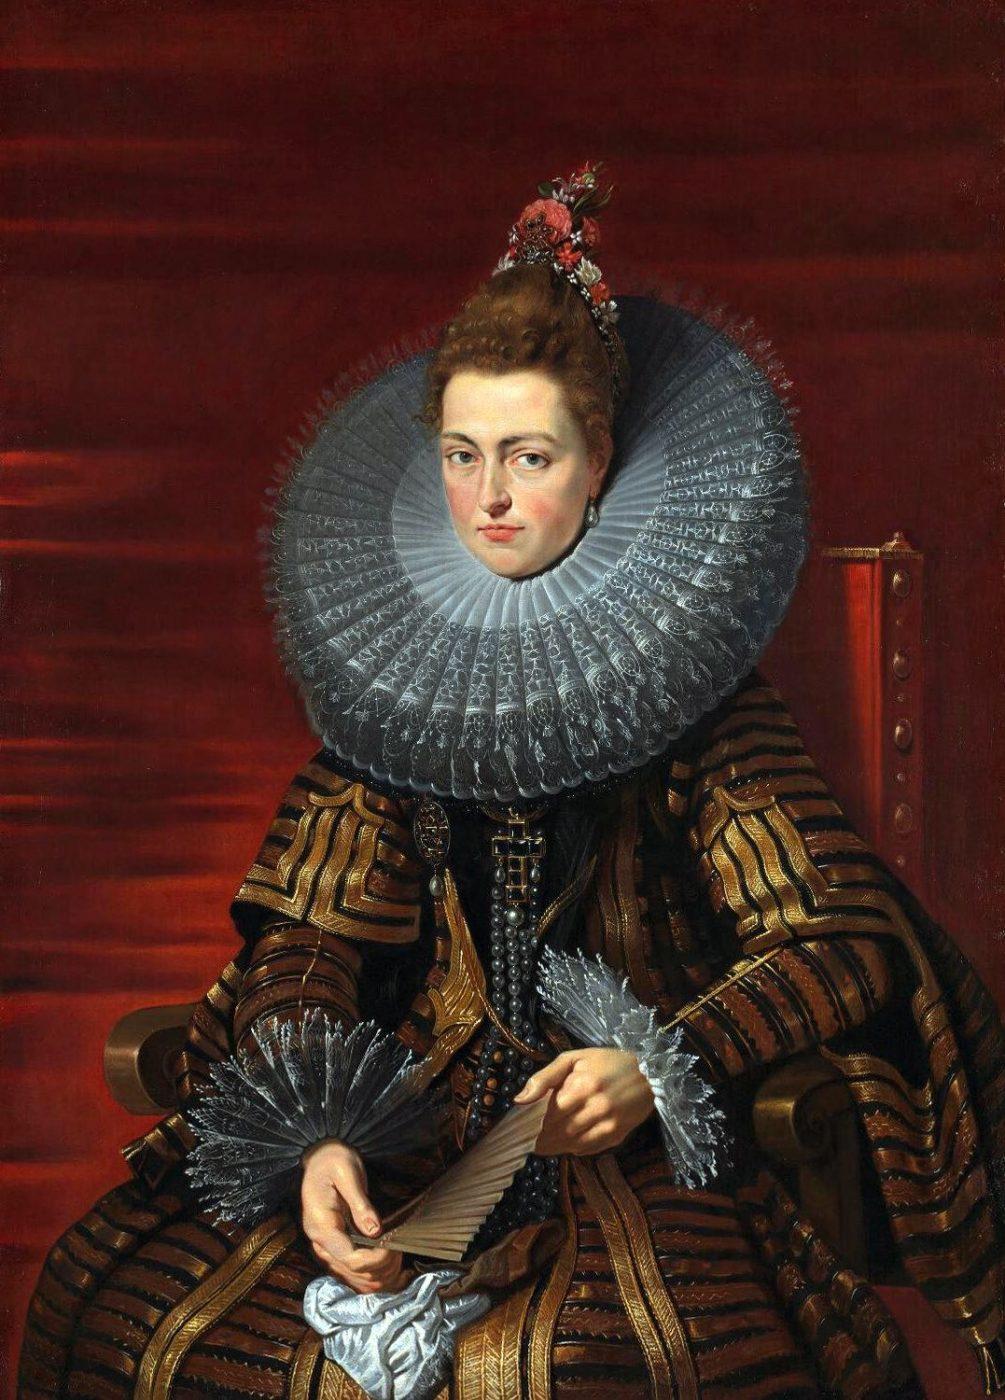 Infanta, ruffs, ruff, Isabella Clara Eugenia, Rubens